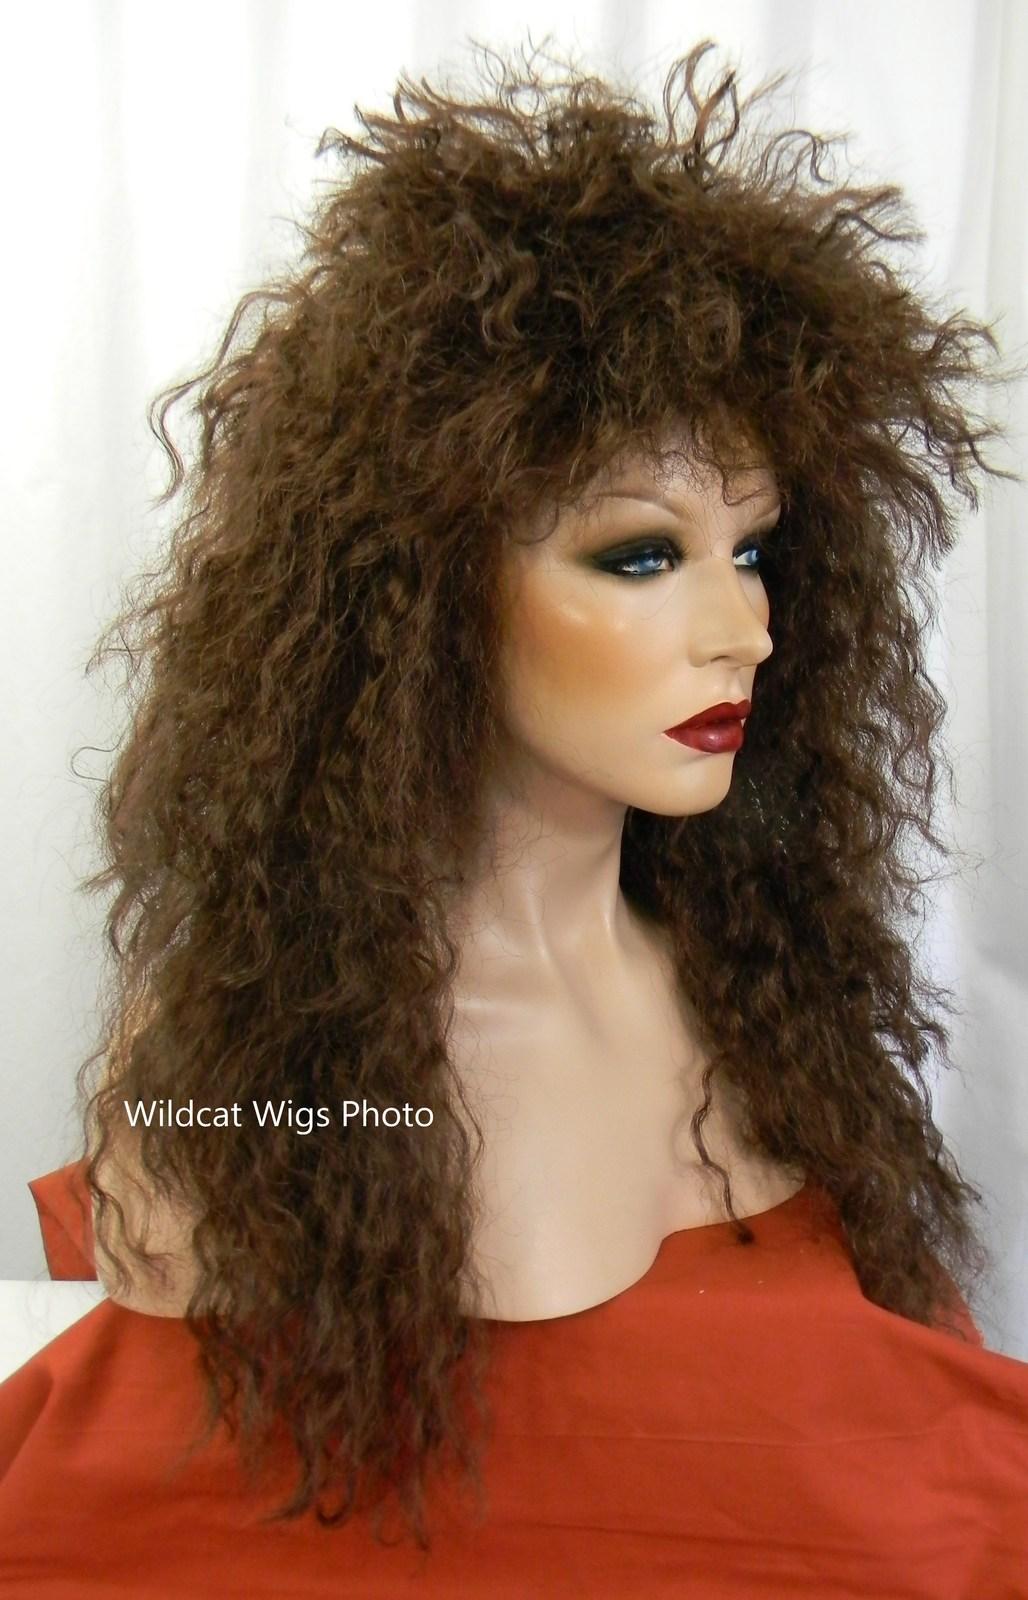 Heavy metal better costume wig unisex and 37 similar items heavy metal better costume wig unisex for men and women bon jovi publicscrutiny Gallery